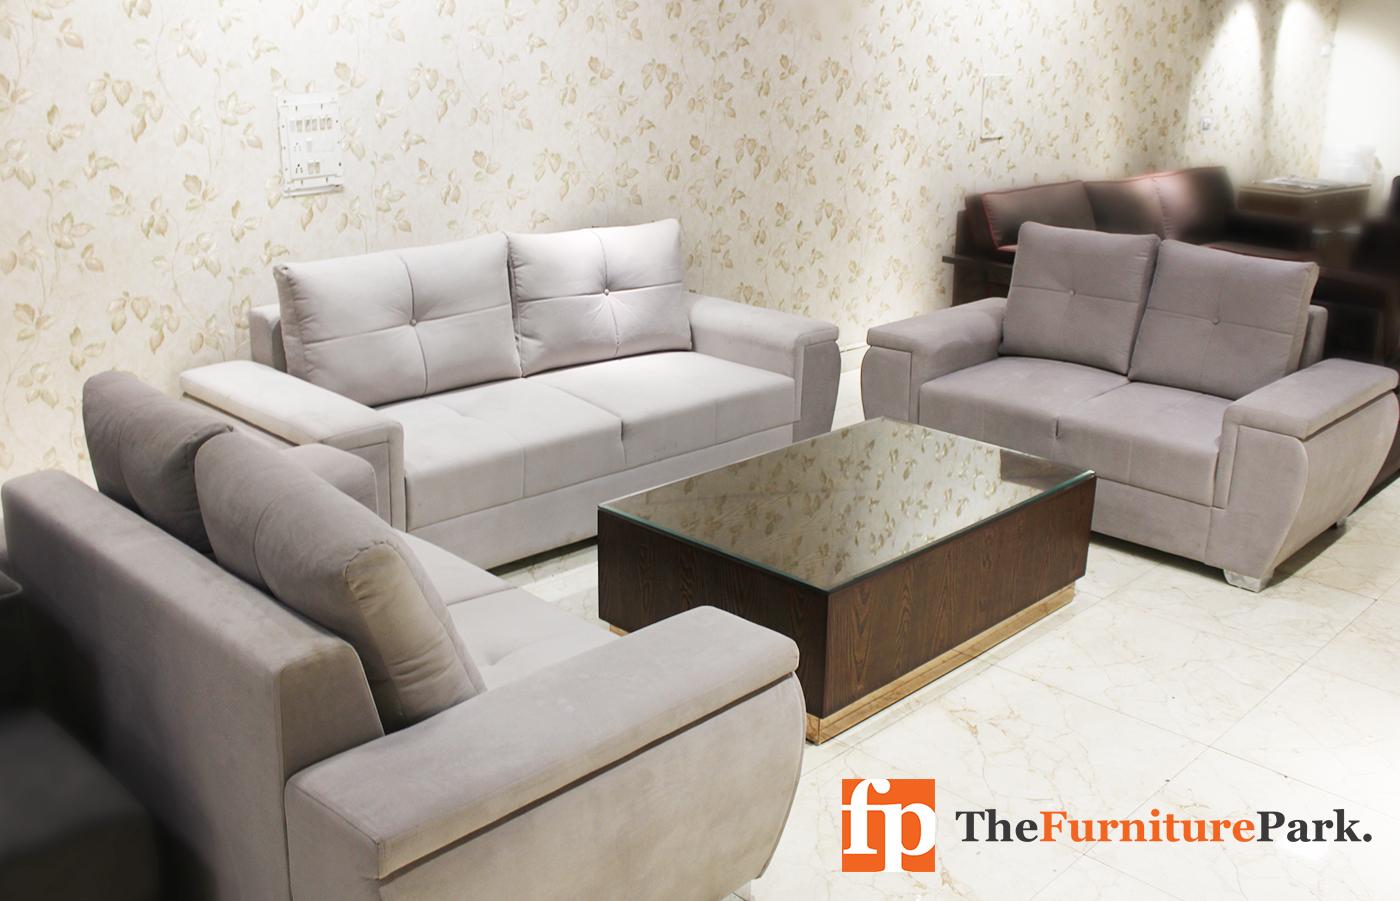 Sonoma 3 2 Sofa The Furniture Park